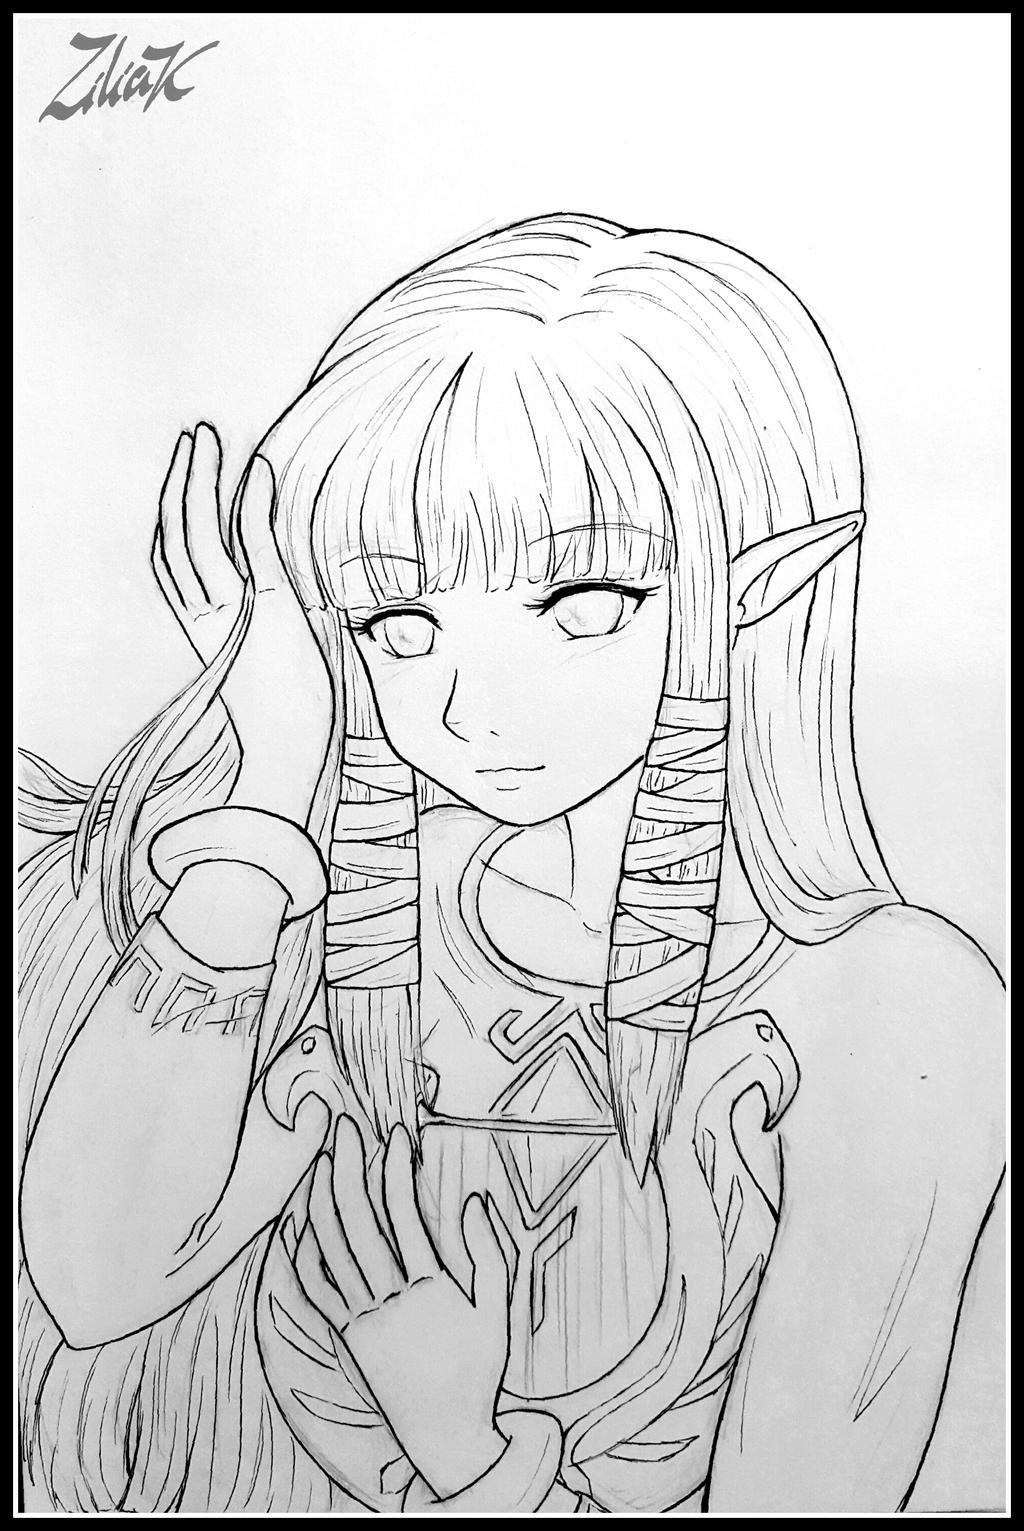 Zelda Skyward Sword line art by zilia-k